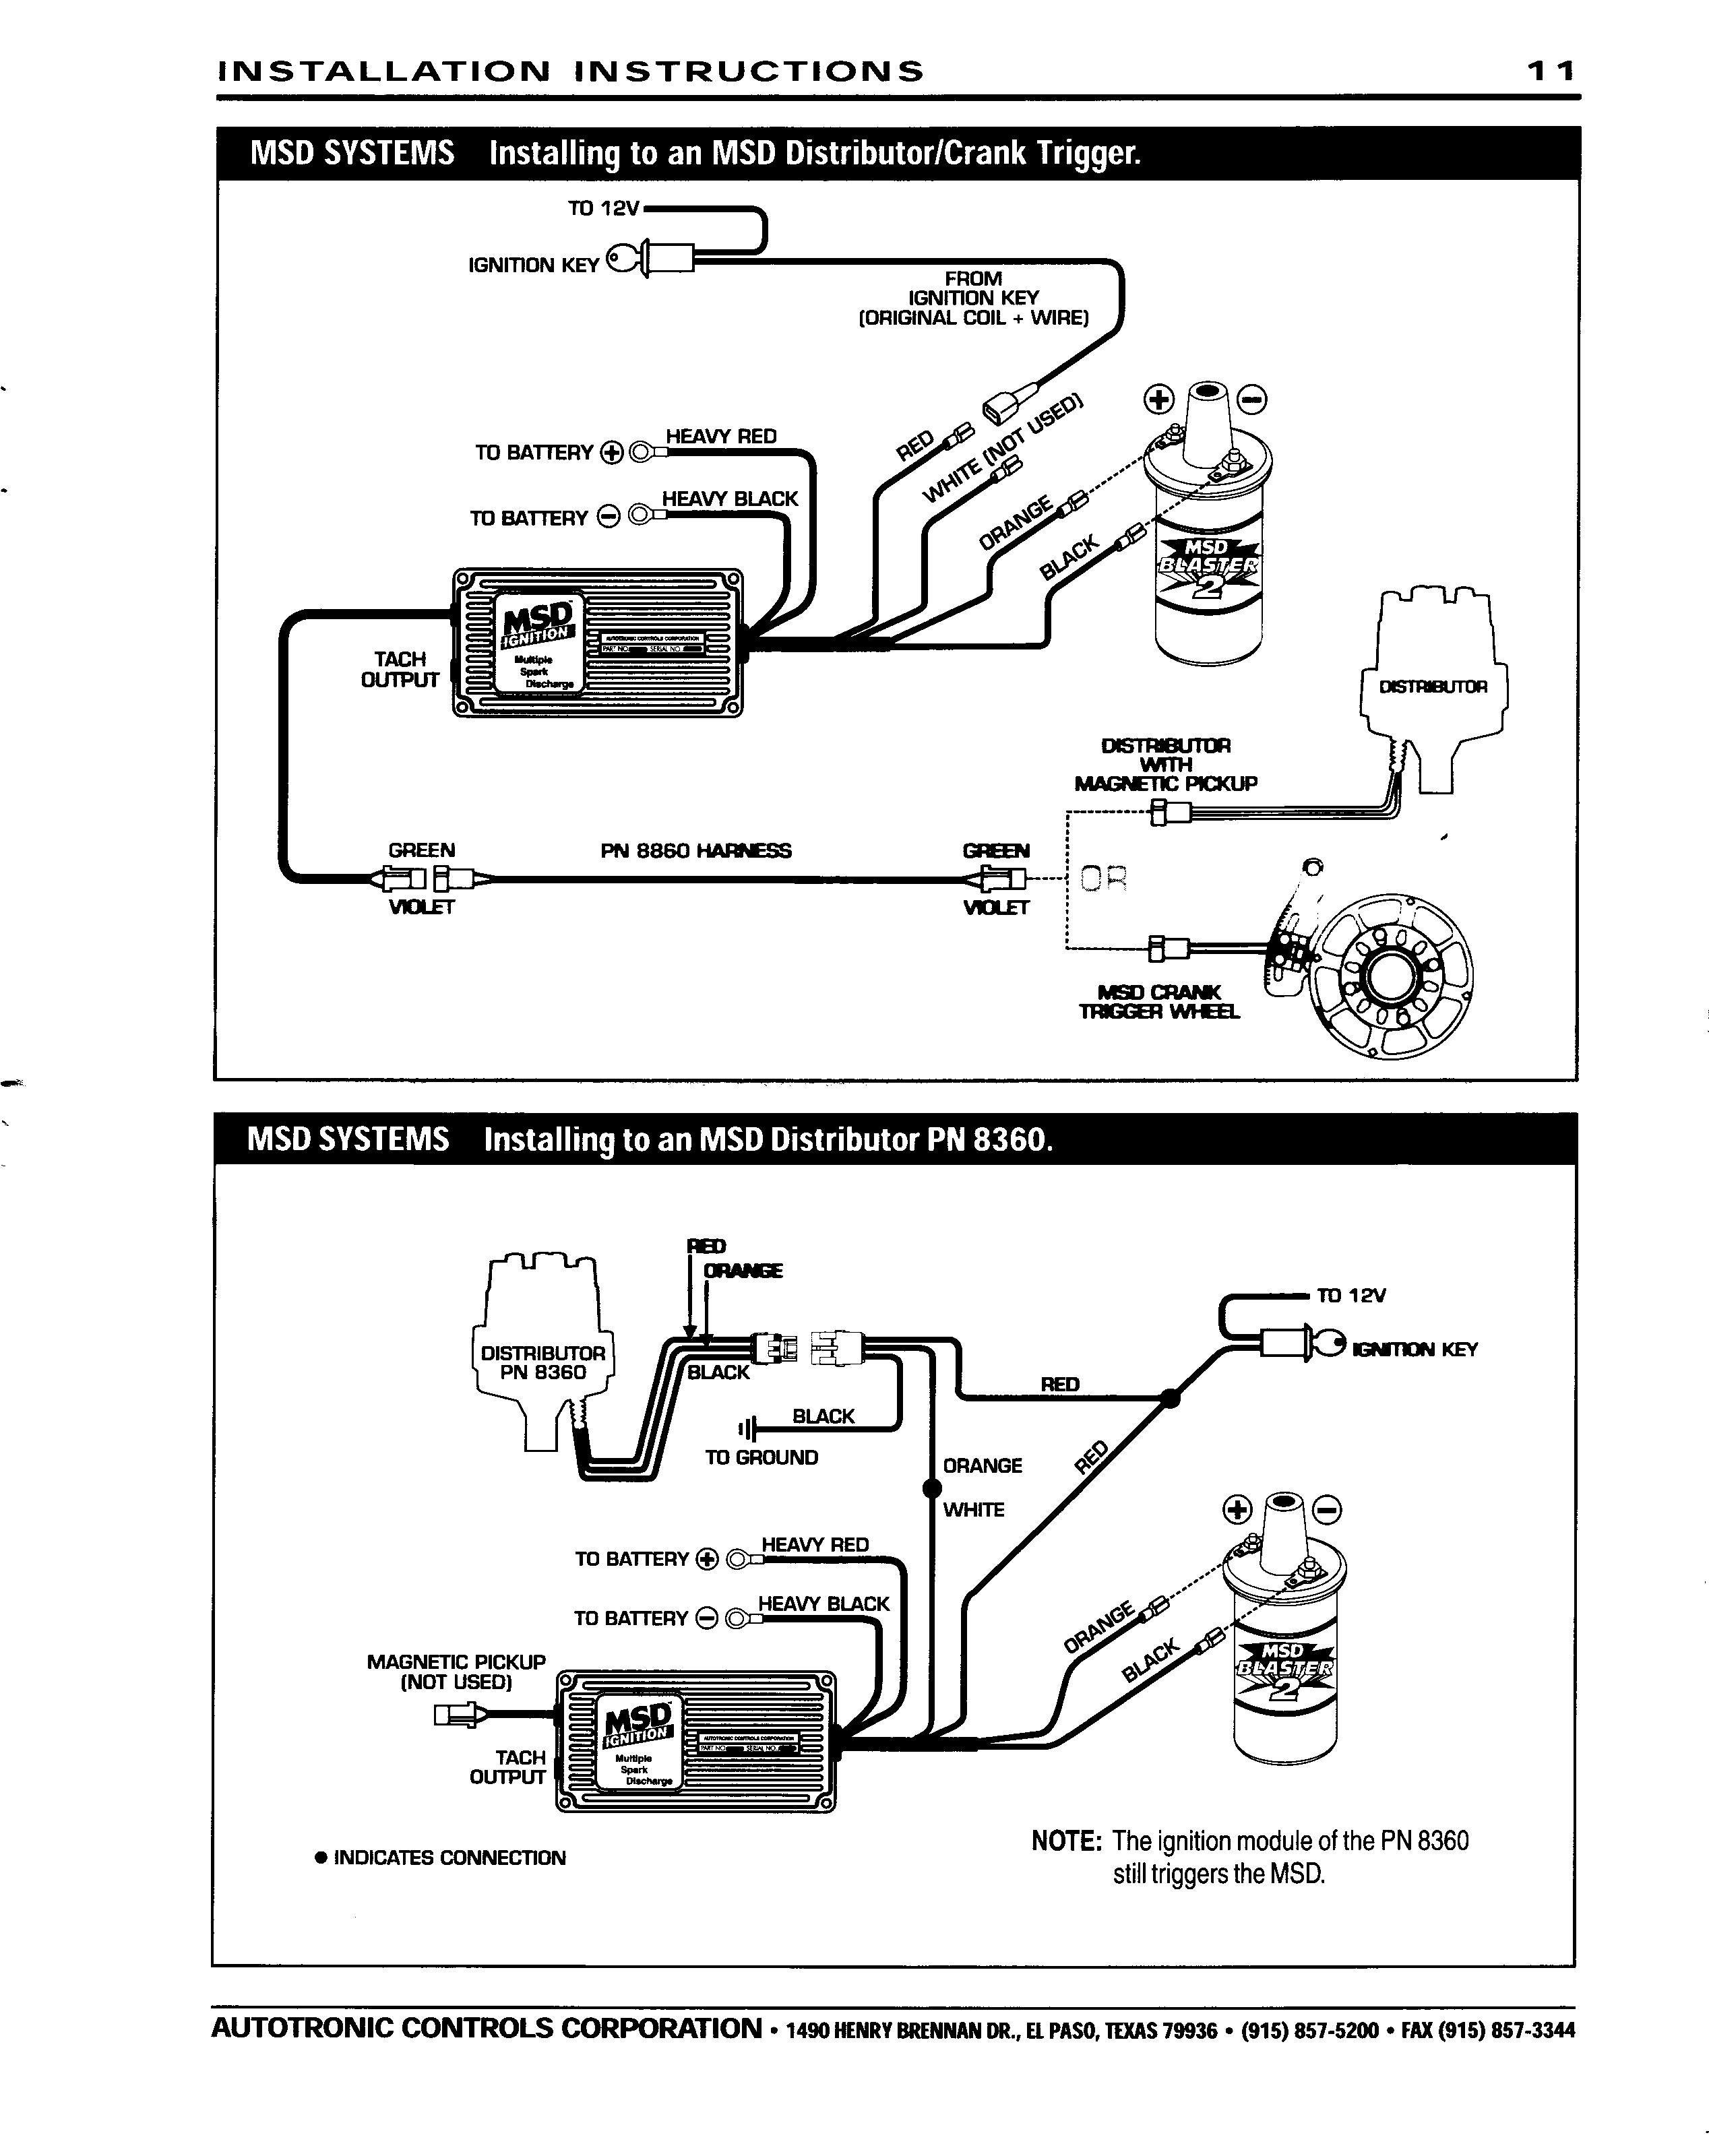 Mallory Unilite Distributor Wiring Diagram : mallory, unilite, distributor, wiring, diagram, Mallory, Ignition, Wiring, Diagram, Export, Long-platform, Long-platform.congressosifo2018.it